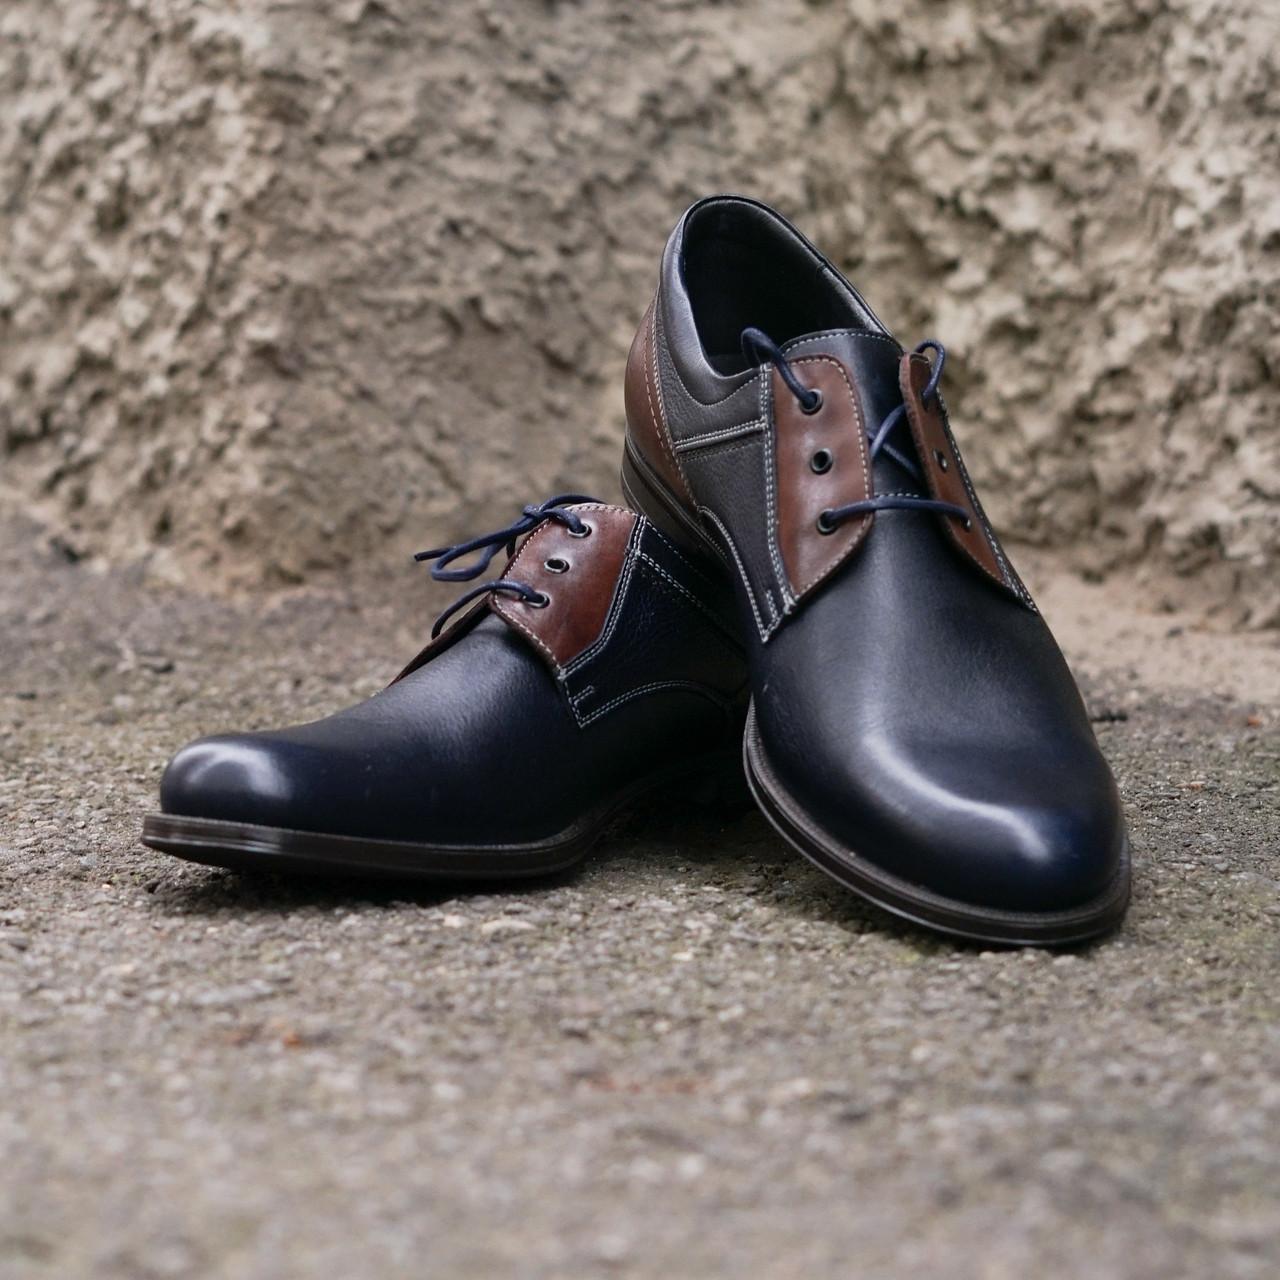 Вау! Польське взуття - гарантія якості!